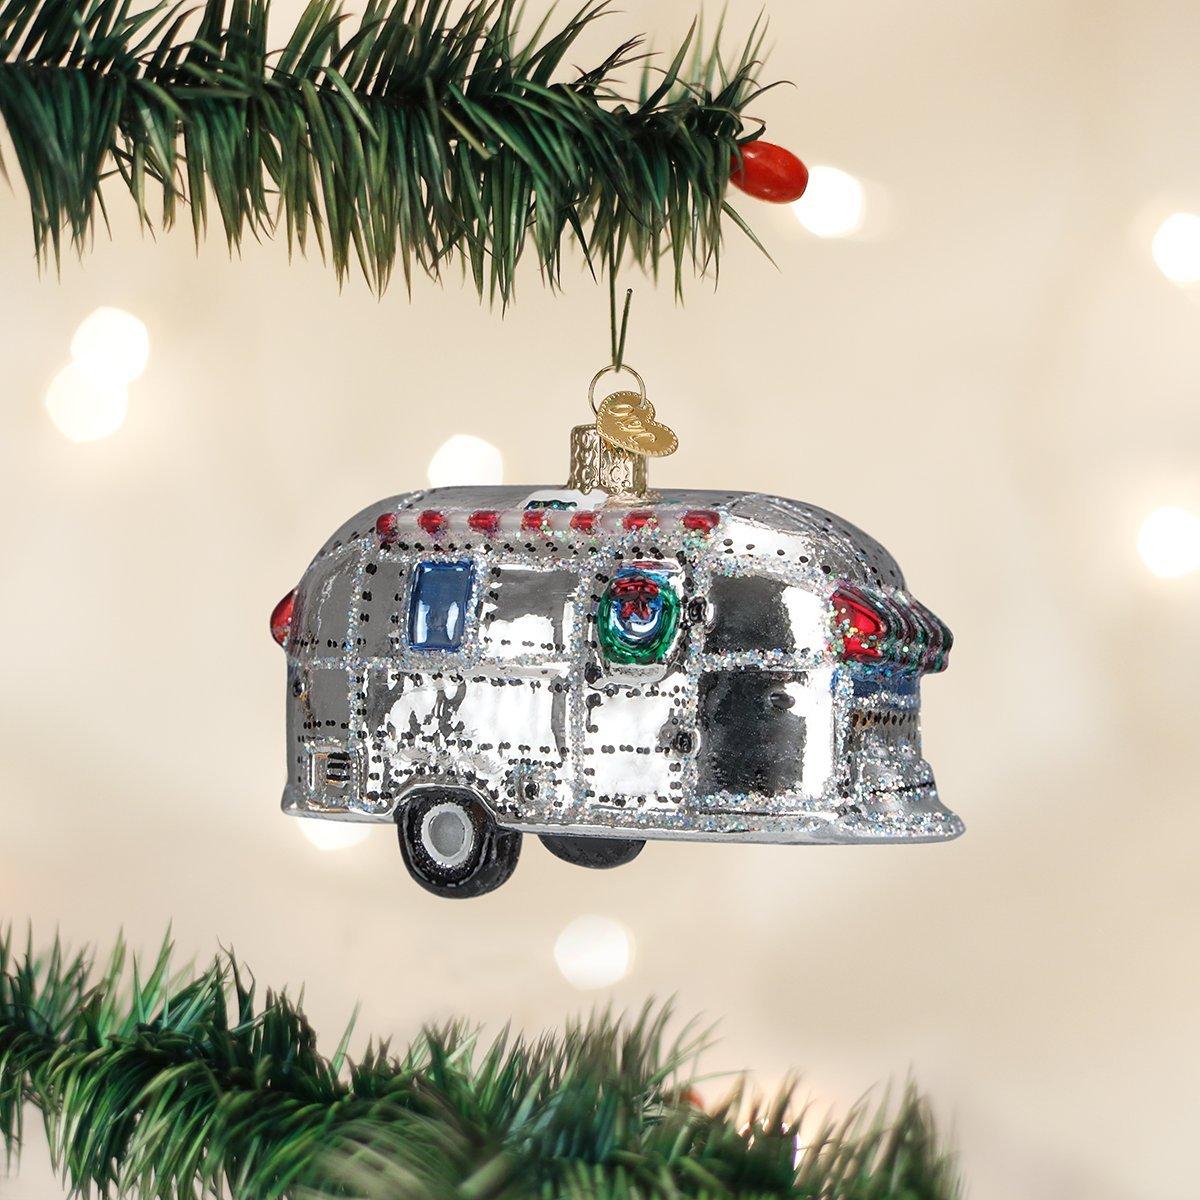 Amazon.com: Old World Christmas Vintage Trailer Glass Blown Ornament ...